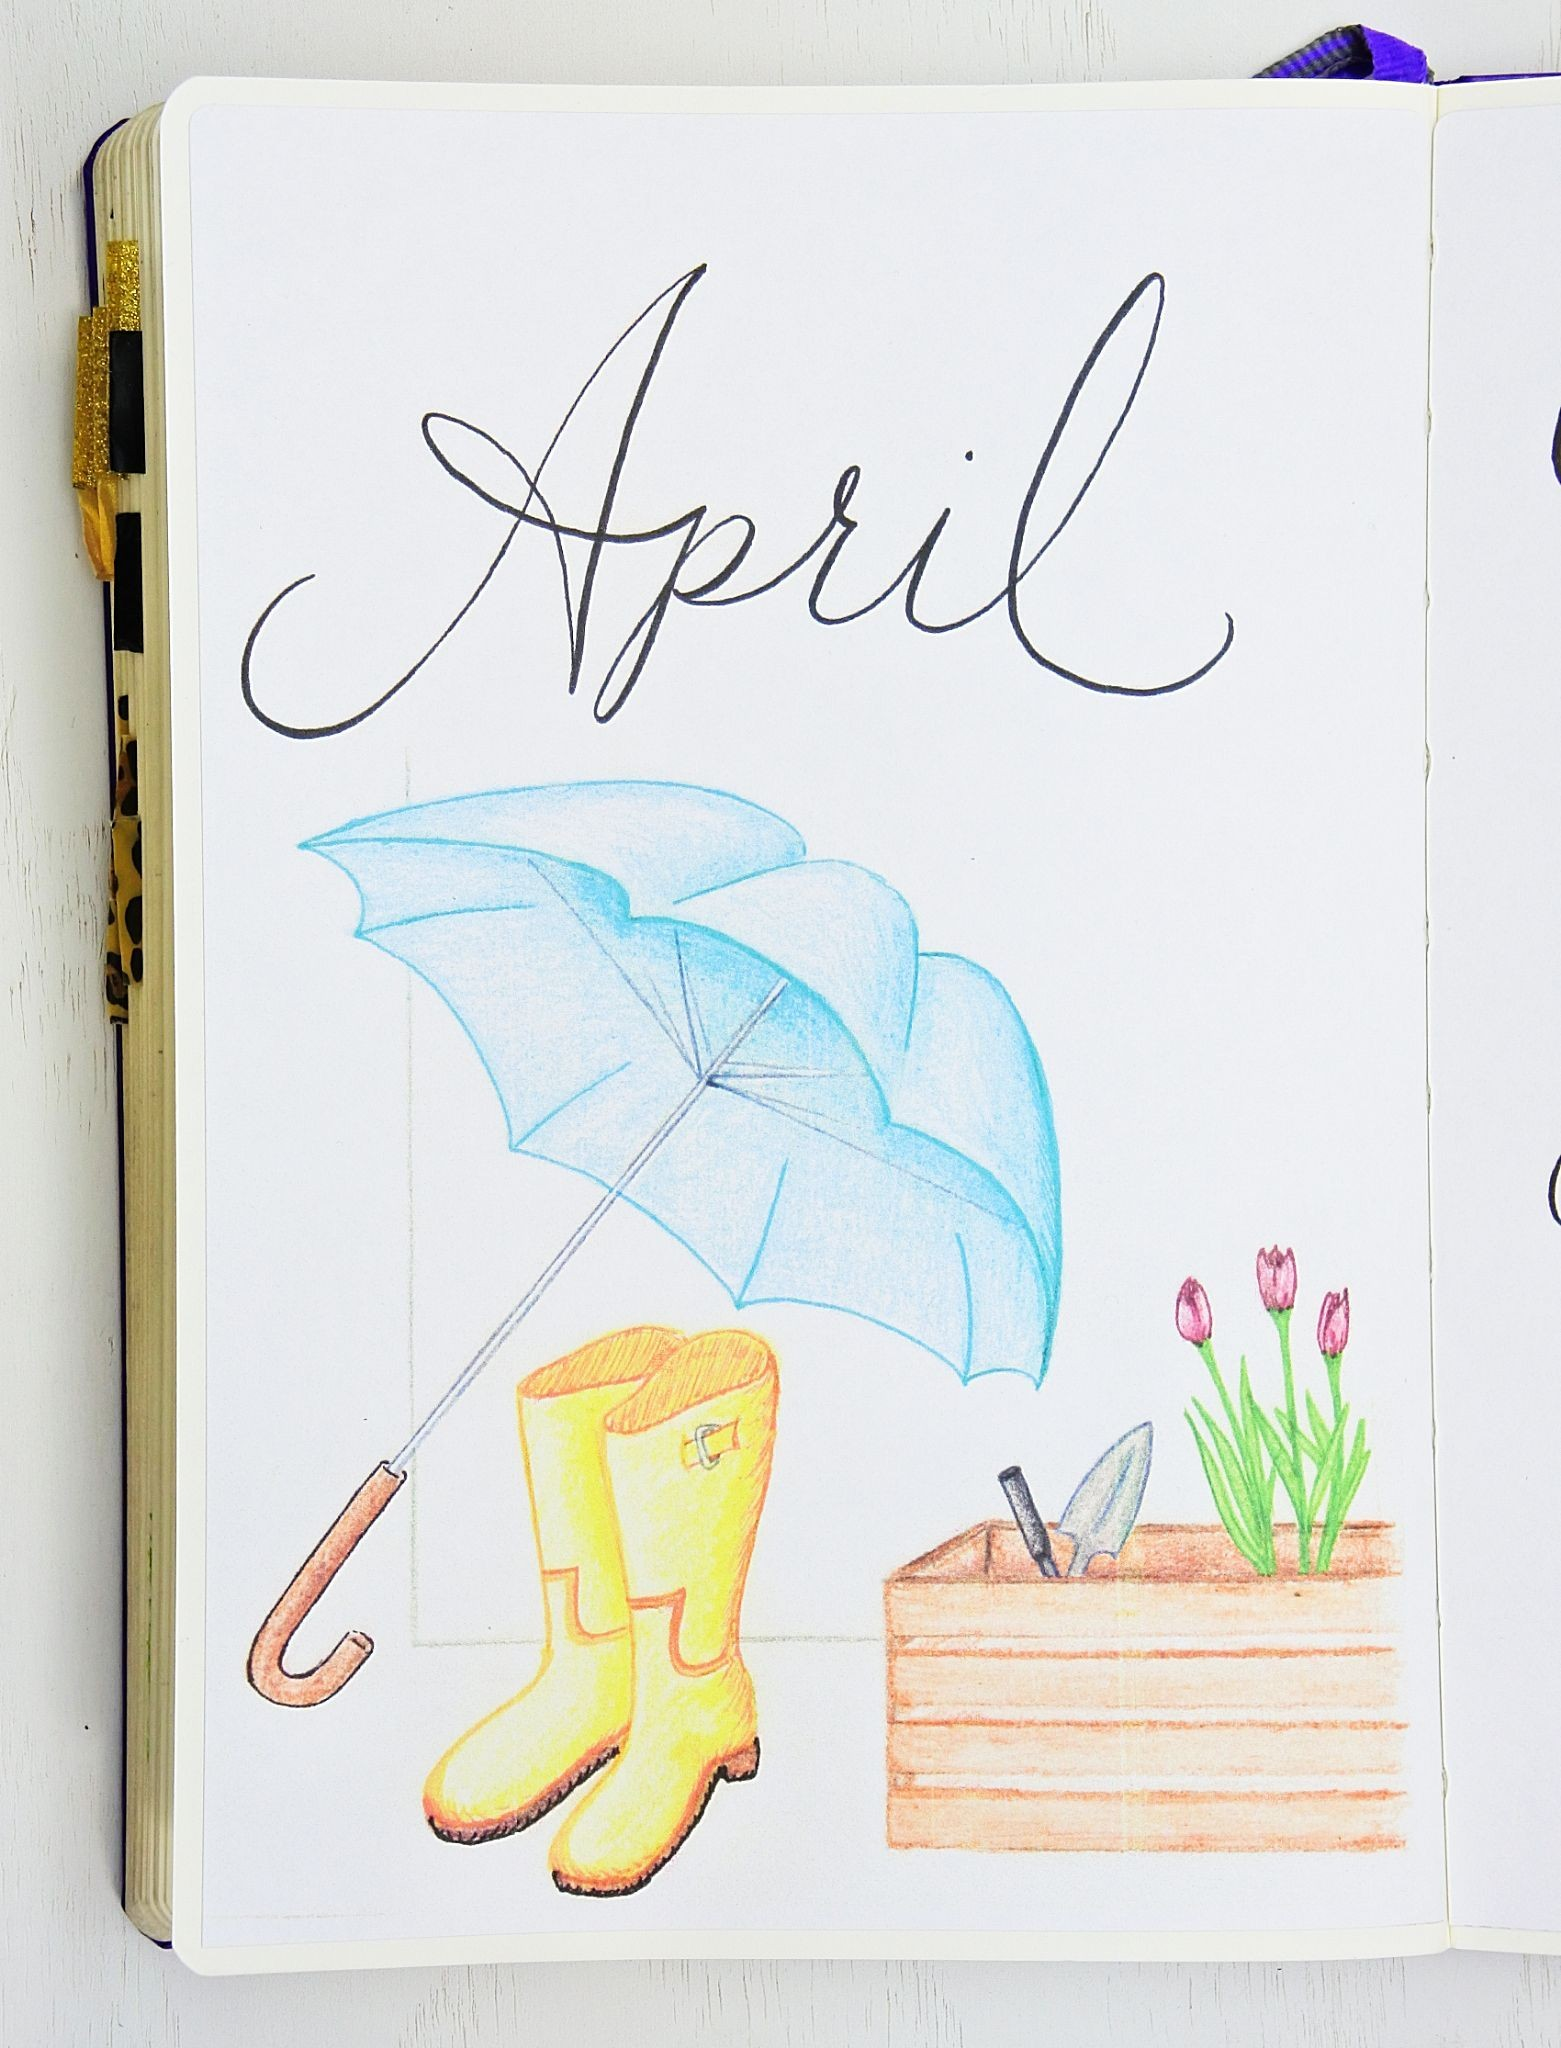 March Calendar Doodles Más Recientes April Setup with 6 Free Printables Bullet Journal Of March Calendar Doodles Más Caliente Free Printable 2017 Calendar Printables Pinterest